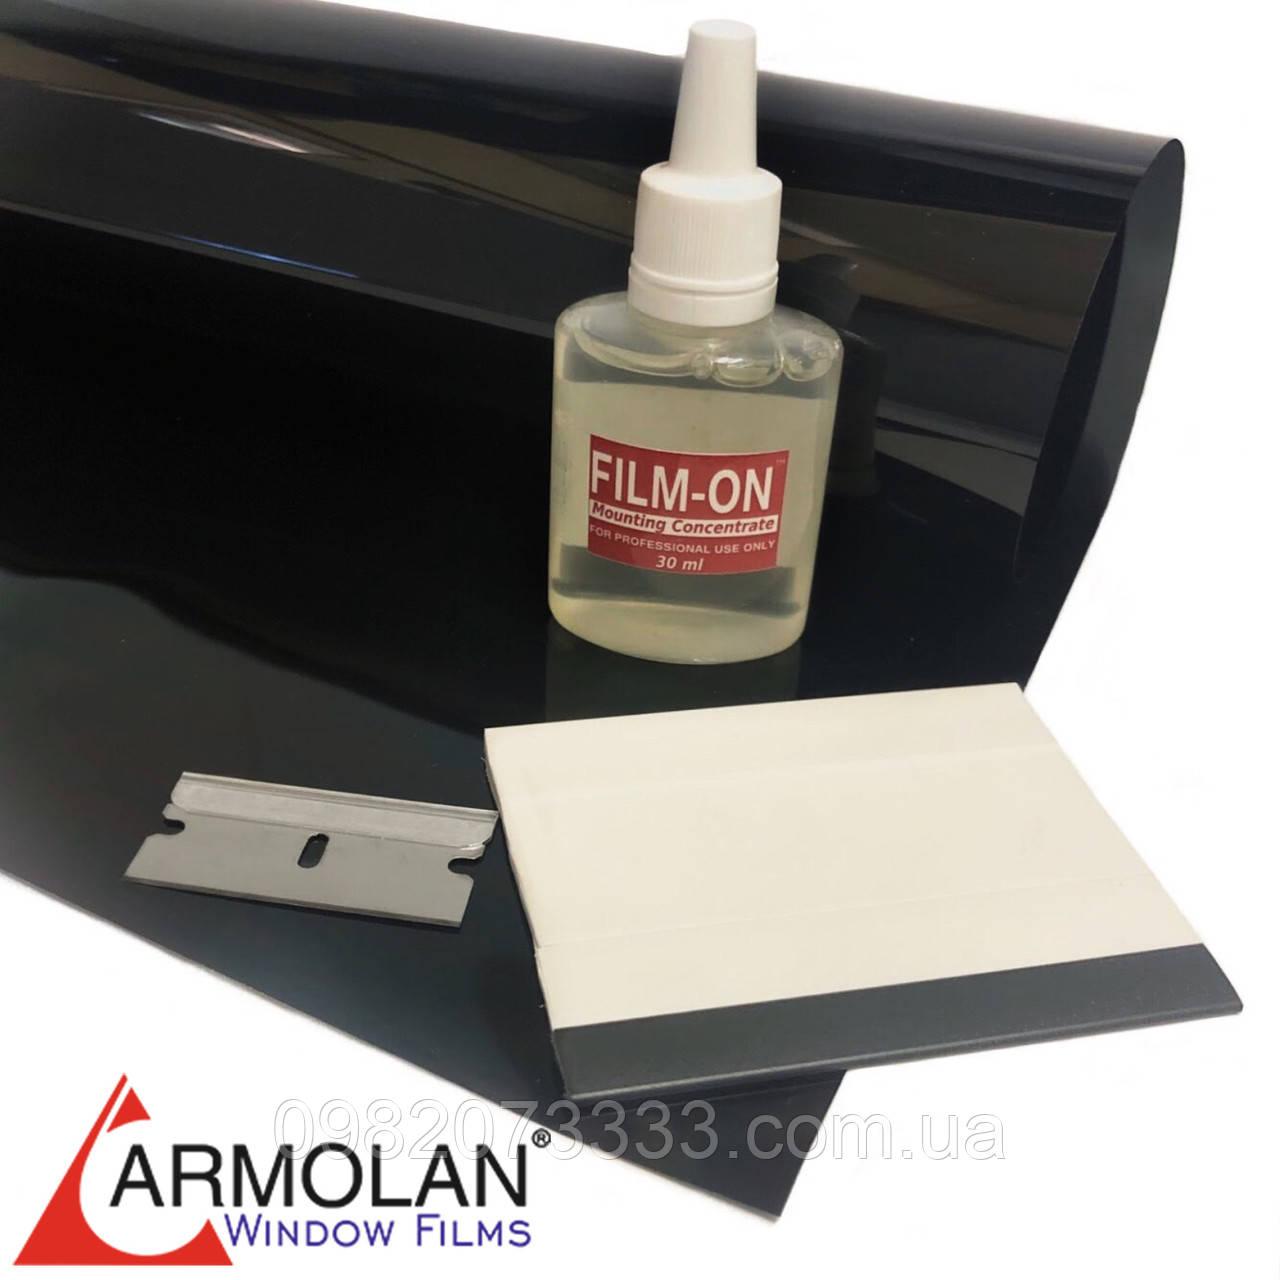 Тонировочная плёнка XAR 20 CH (размер 0,75х3м) + инструмент для тонировки авто Armolan США цена за комплект